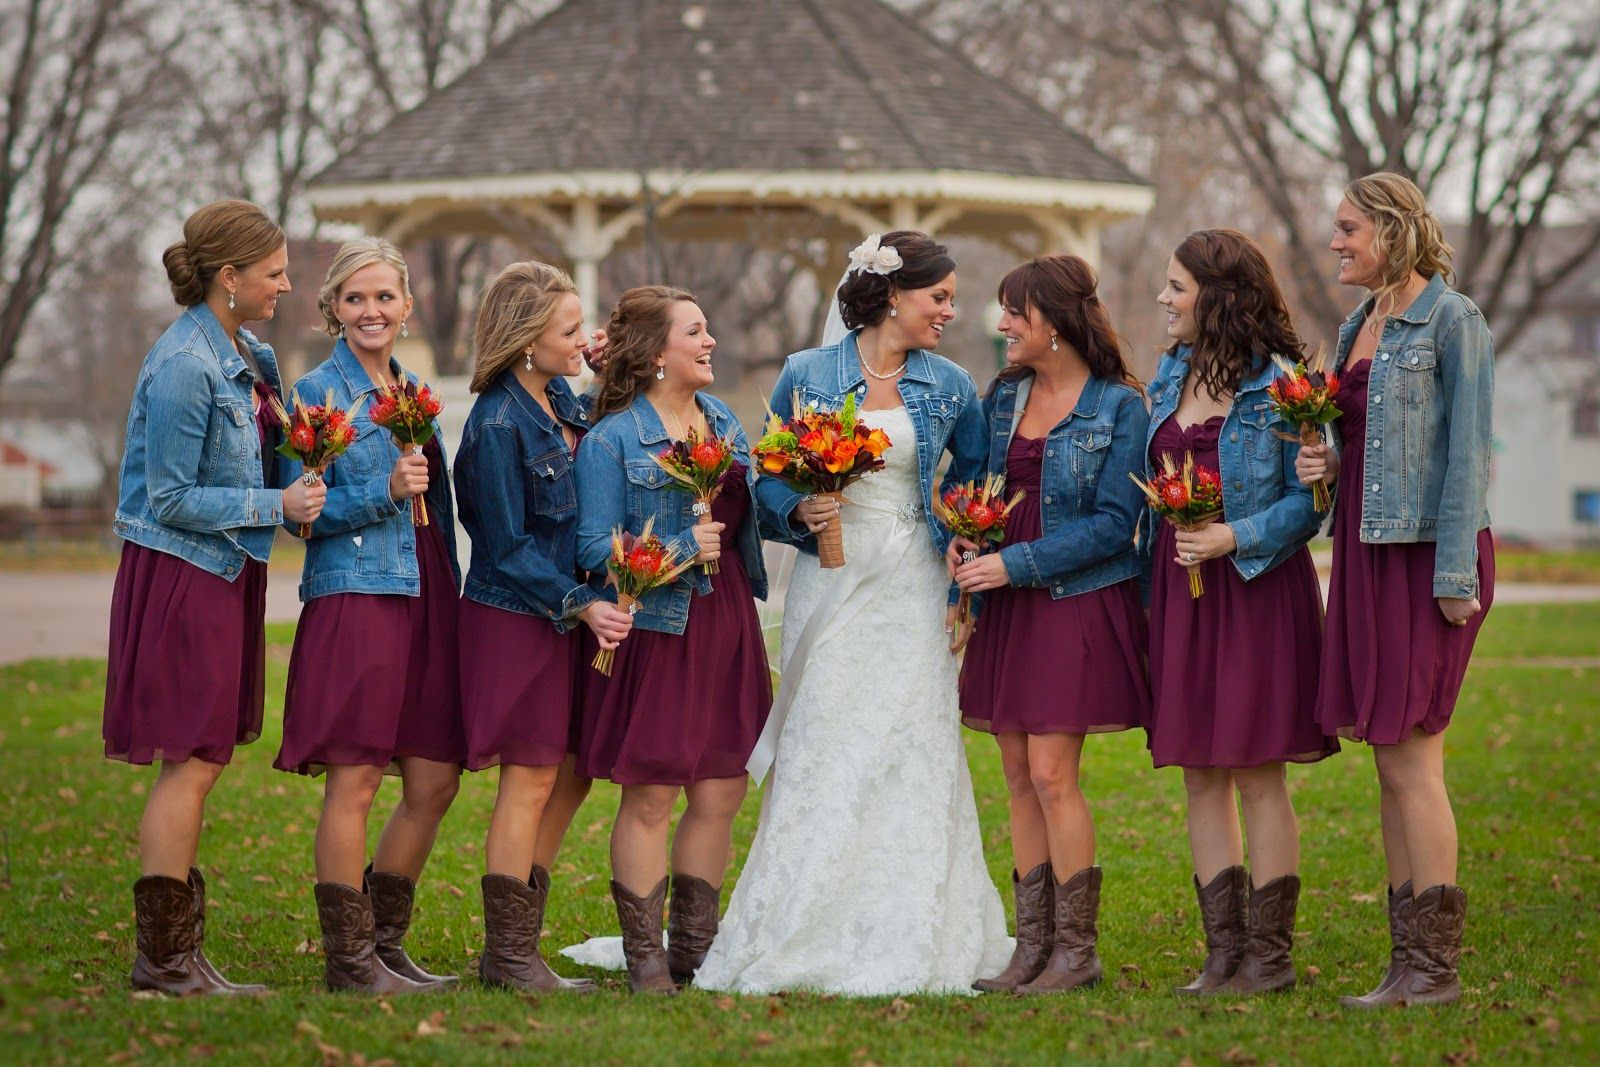 Pin by ashley anowensyahoo on country wedding pinterest